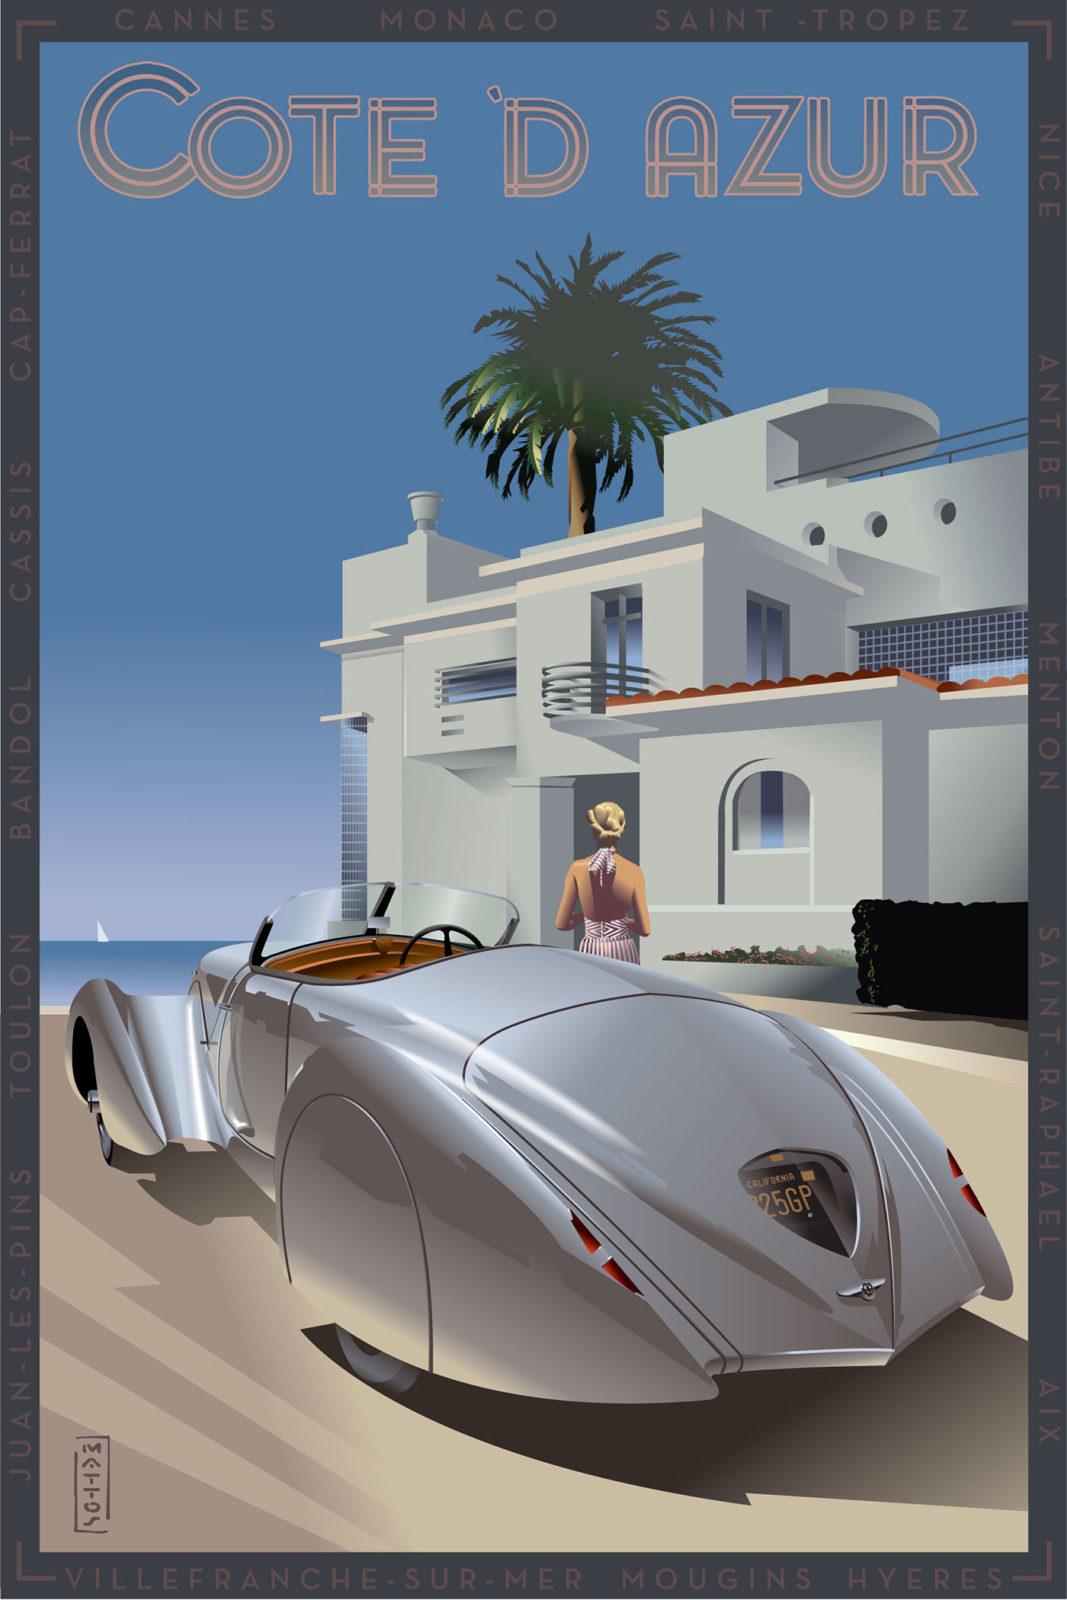 Richard Solomon - John-Mattos-191-Bentley-ART24x36